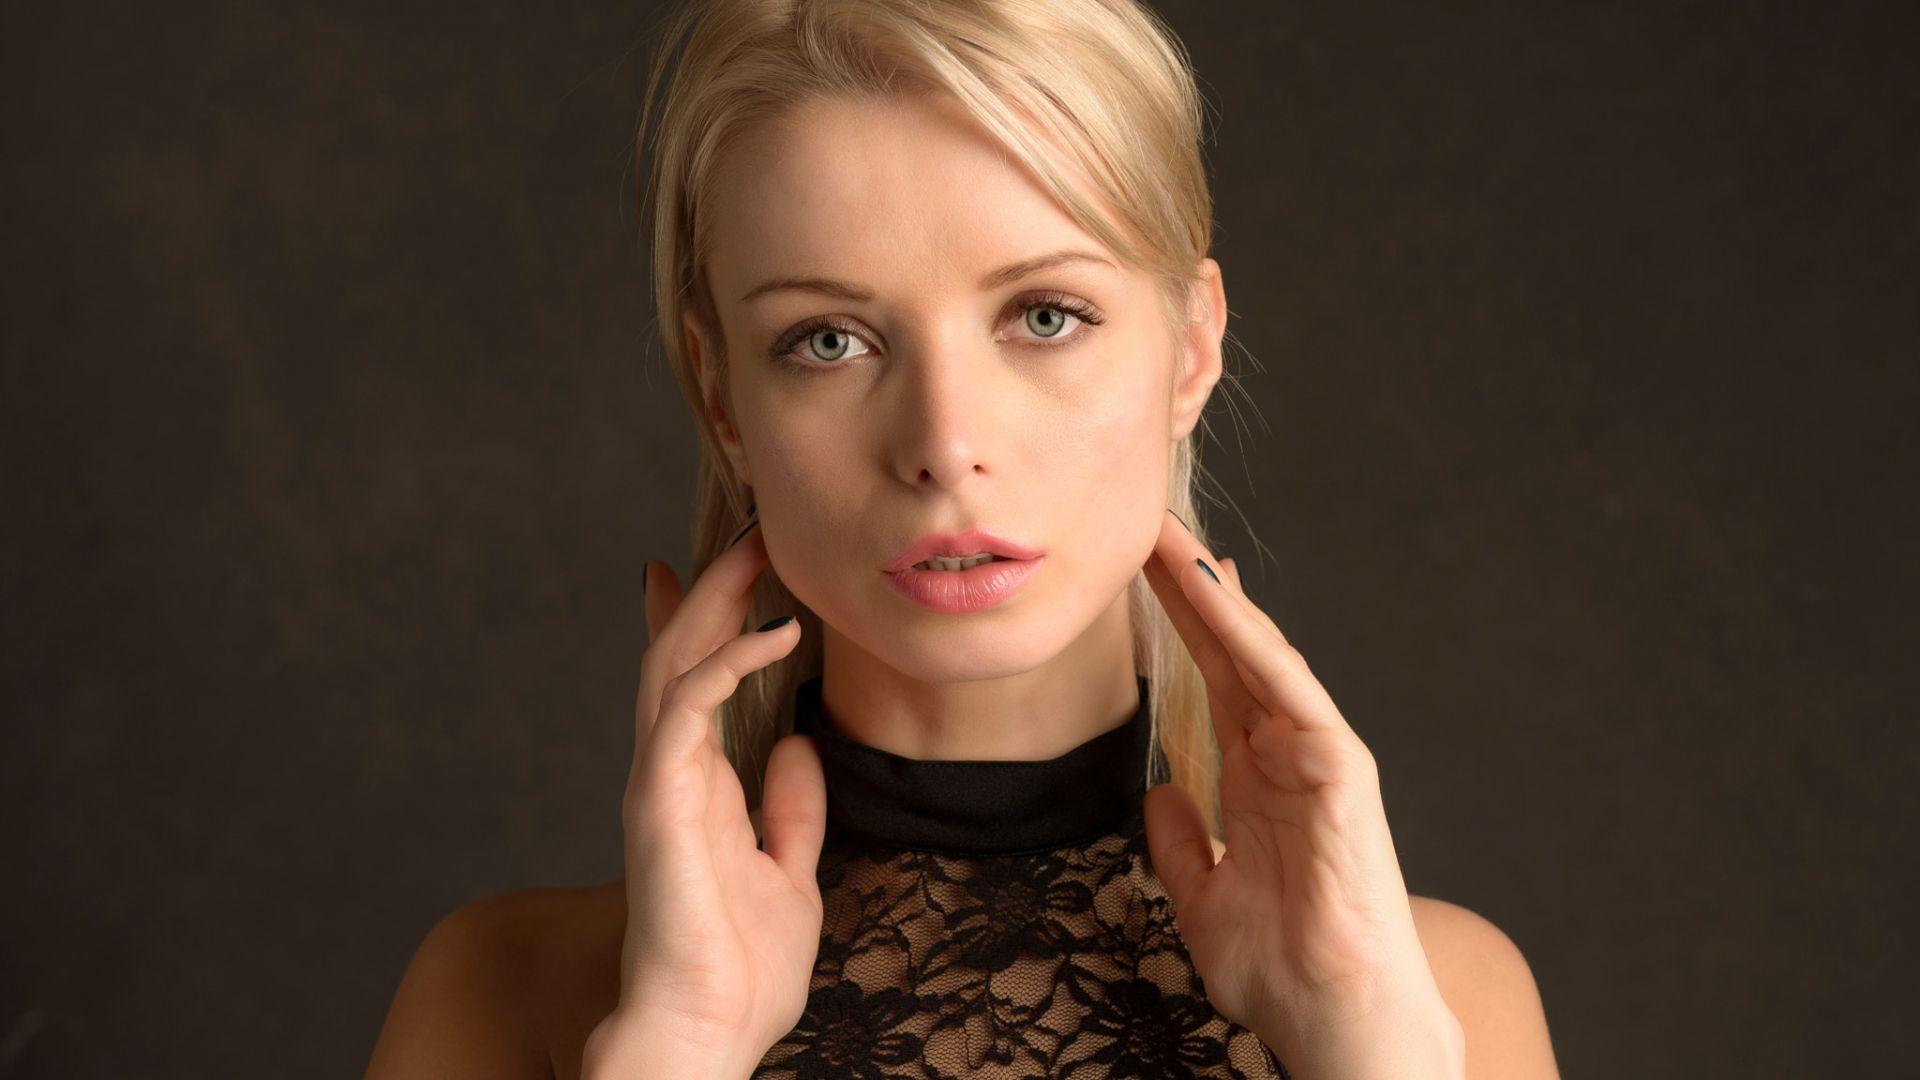 Wallpaper Ekaterina Enokaeva, blonde model, face